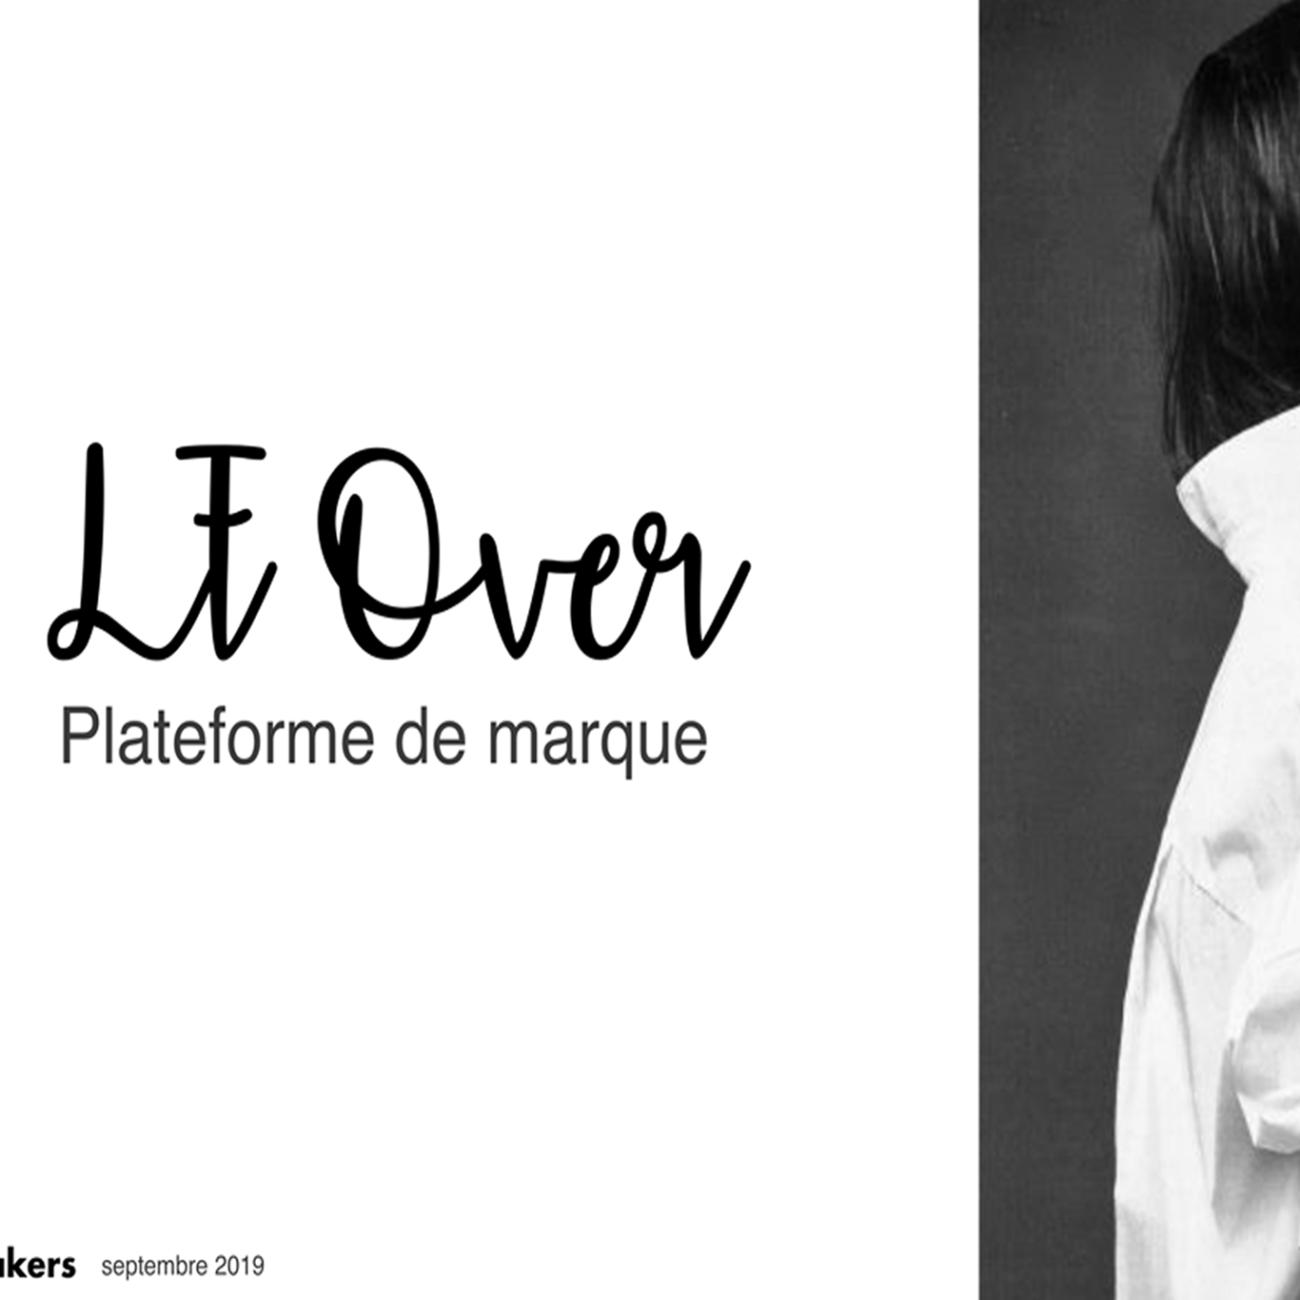 LFOver portfolio image 1